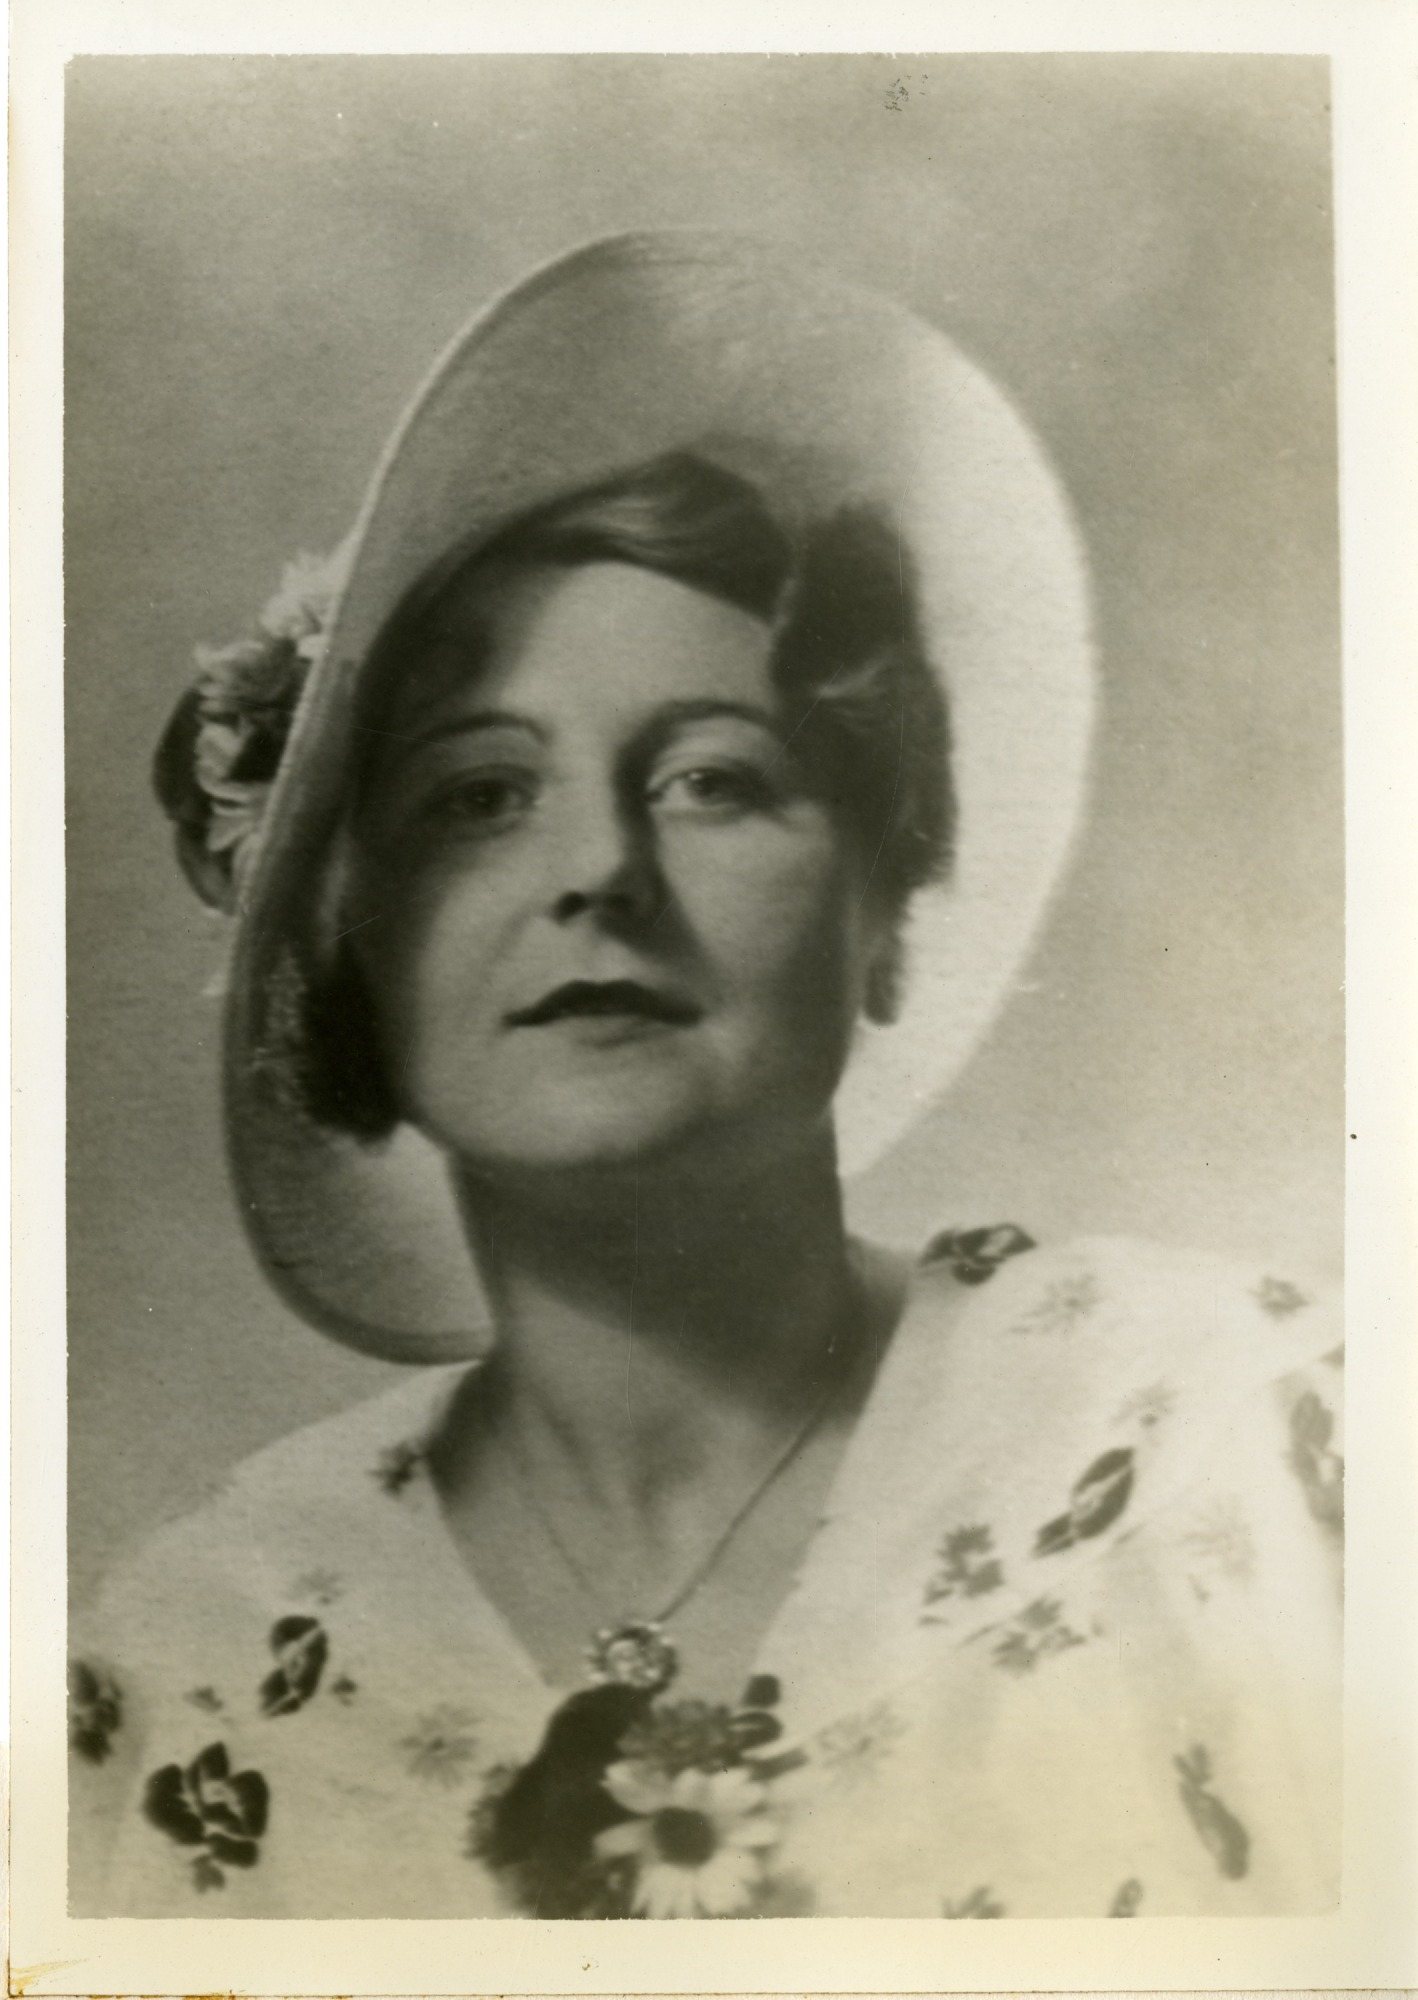 Editha Karl-Kroupa, 1934, Smithsonian Institution Archives, SIA Acc. 90-105 [SIA2008-4975].